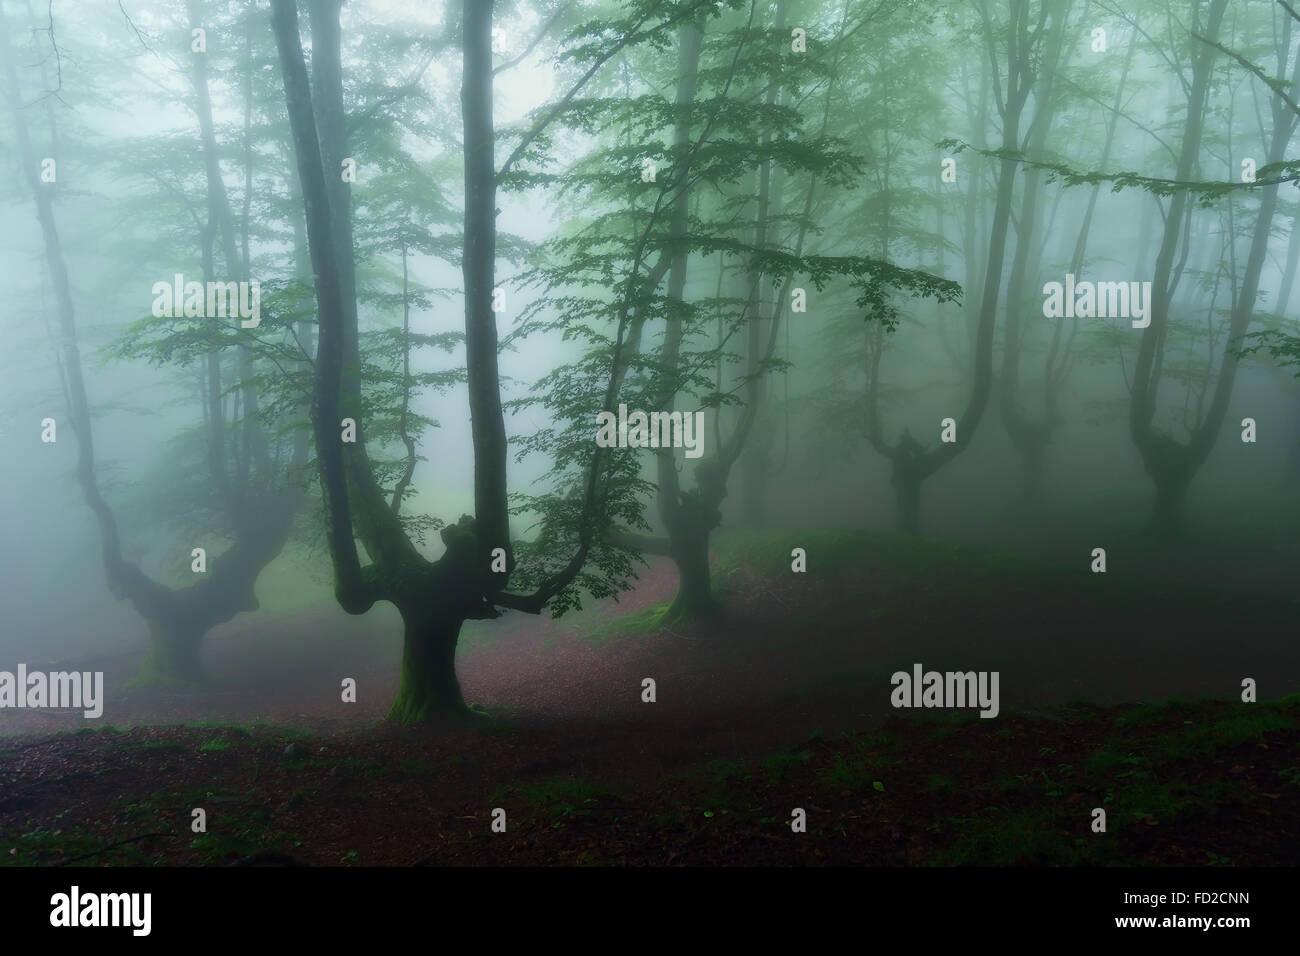 Sombre et effrayant forêt profonde Photo Stock